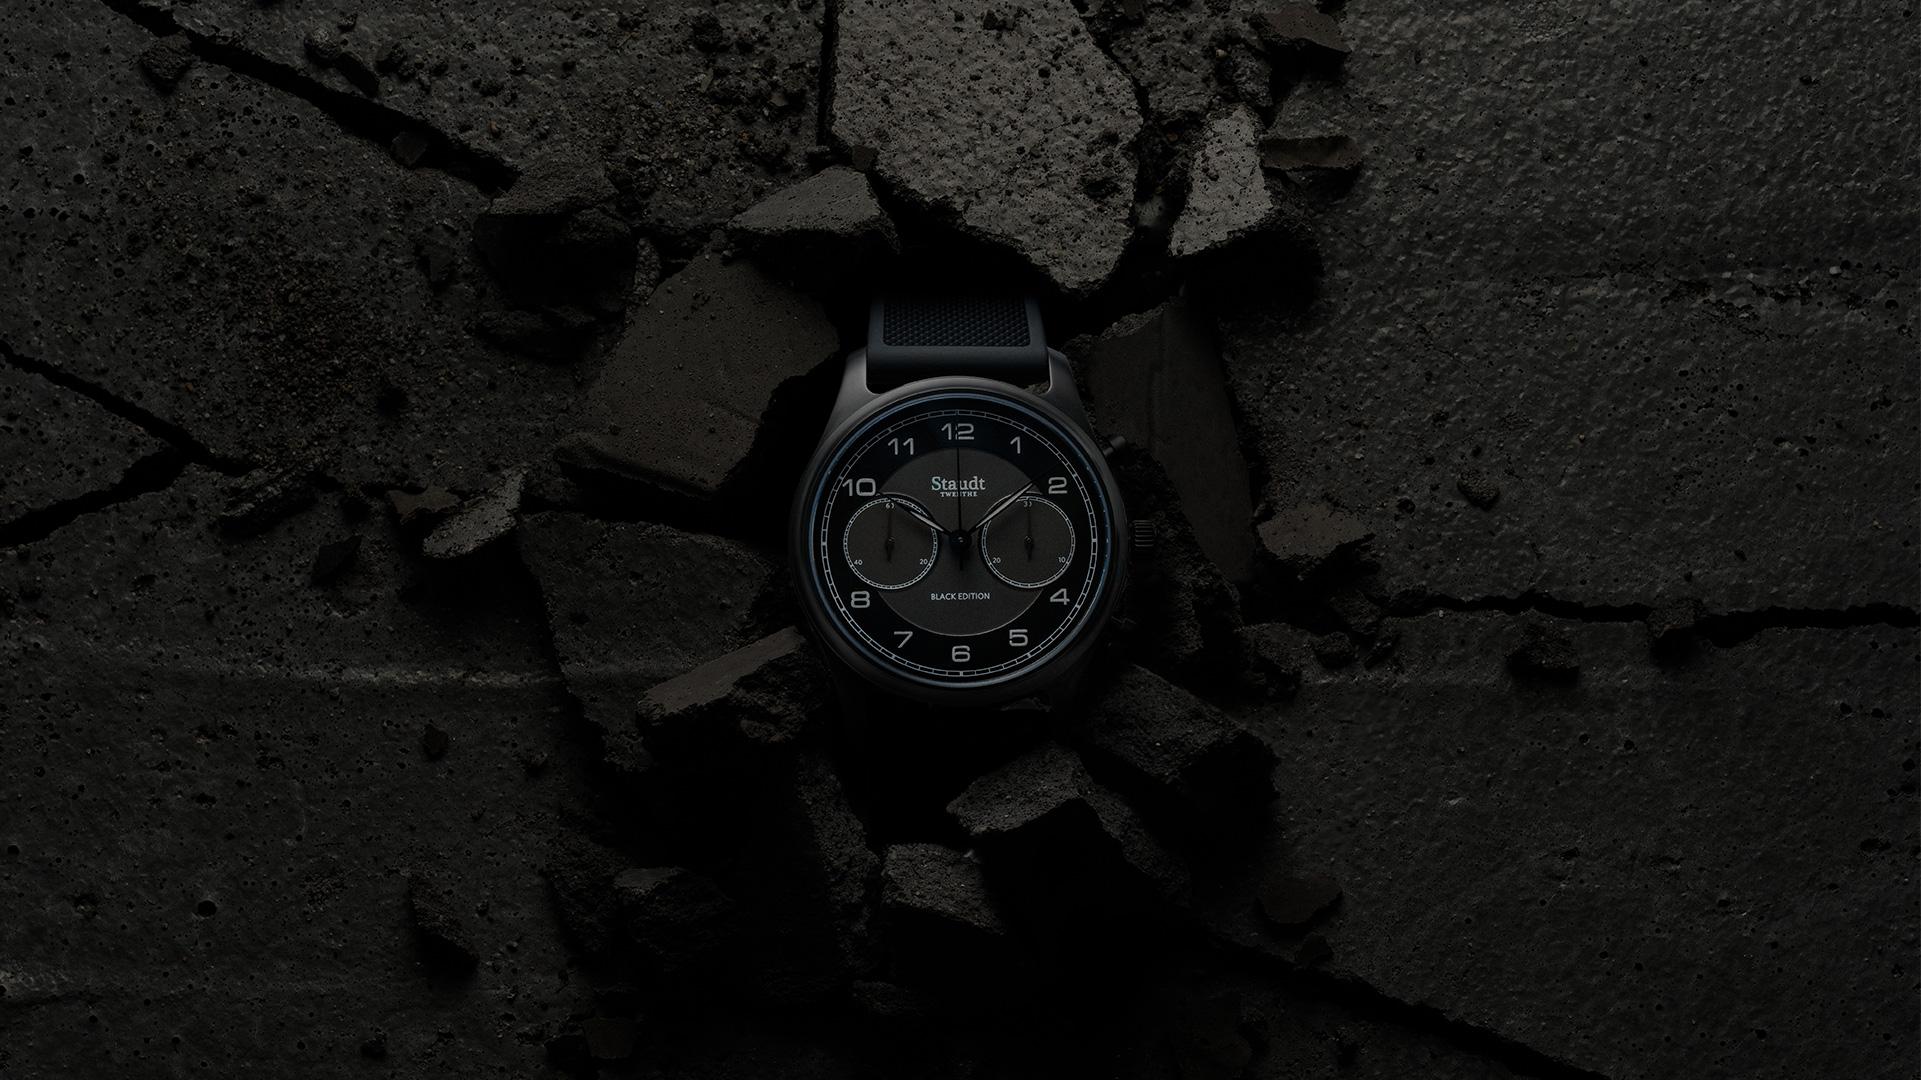 https://www.staudt-twenthe.com/wp-content/uploads/2019/11/Staudt-Praeludium-Chronograph-Black-Edition2.jpg